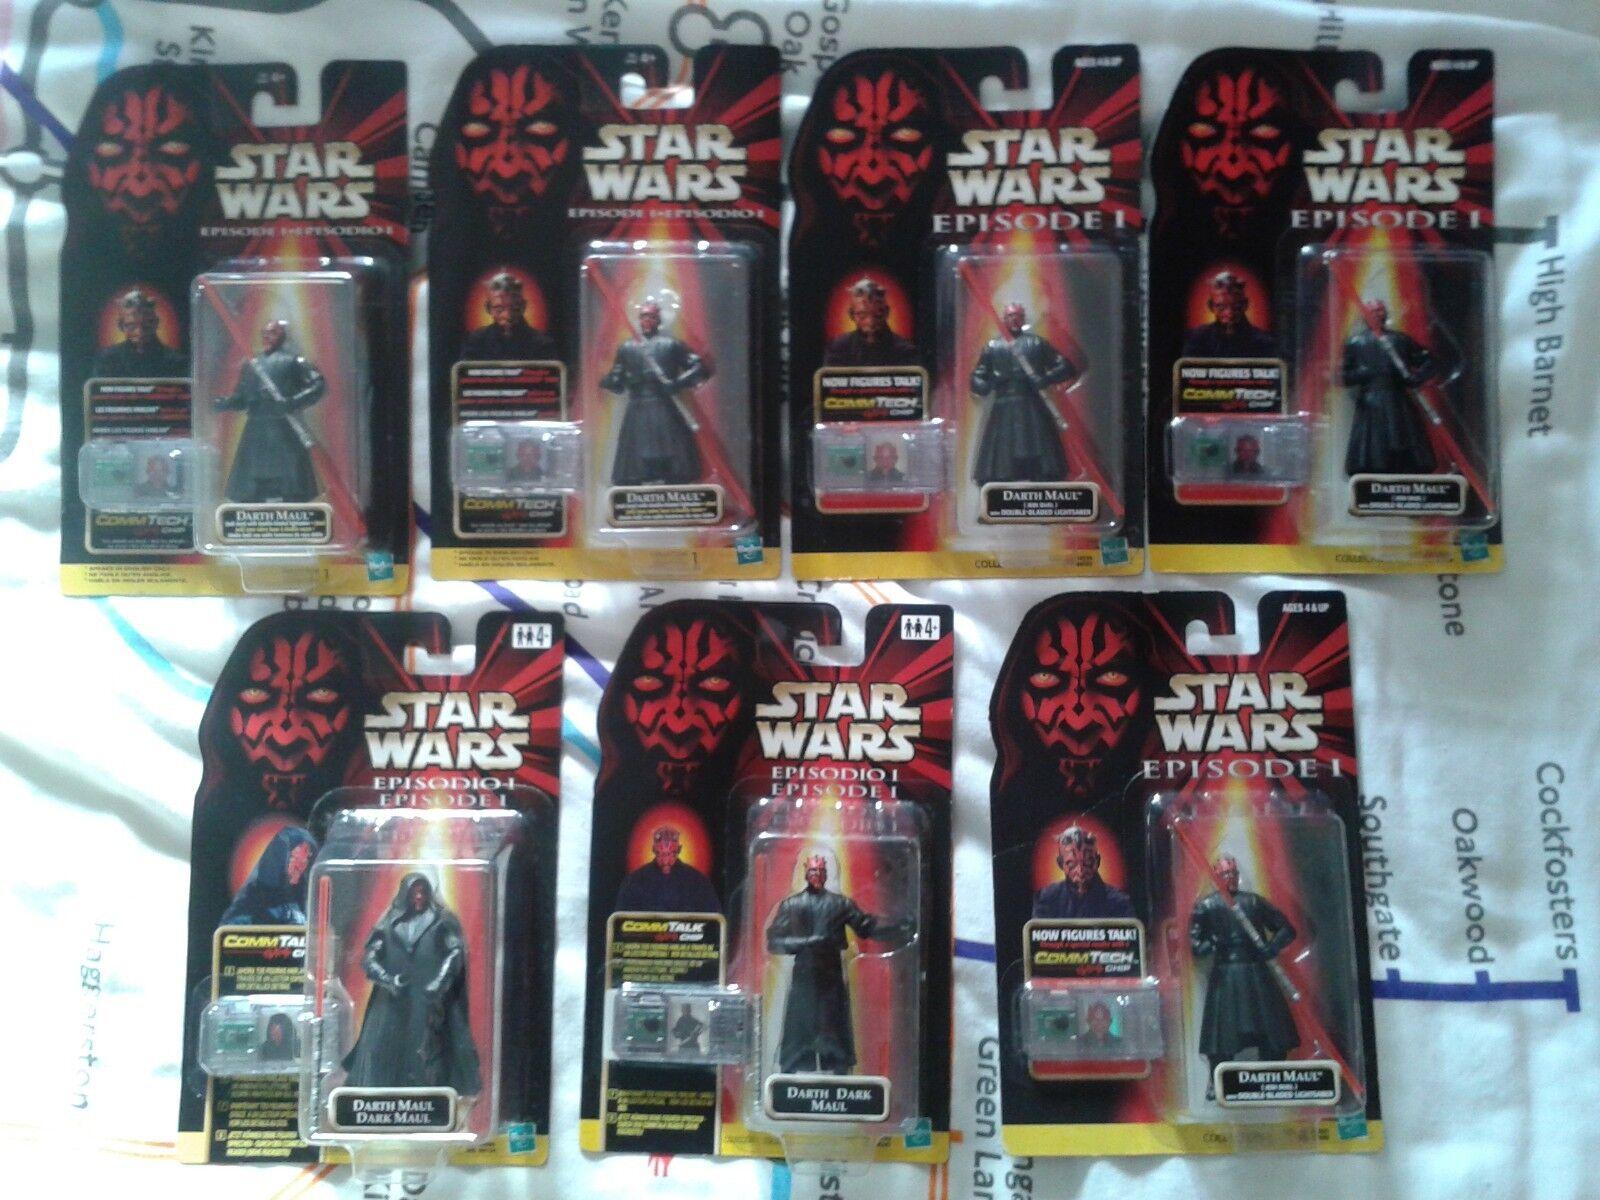 Star wars ep1 darth maul figures mosc 1998